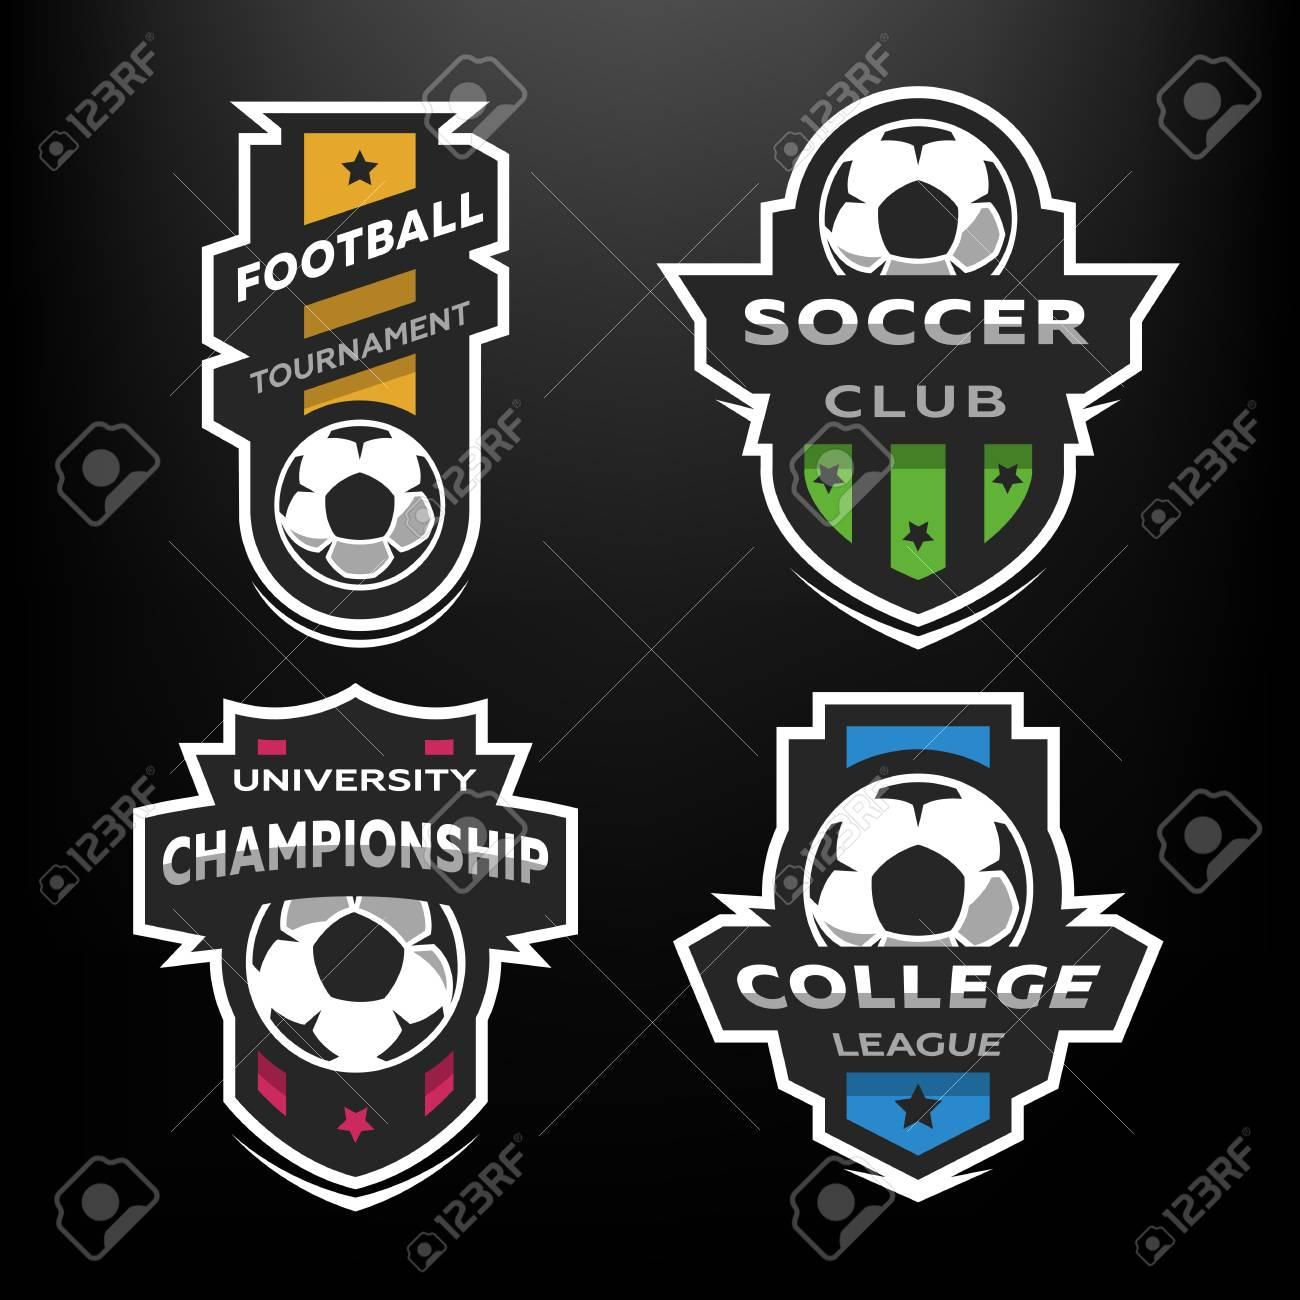 Set of Soccer Football logo, emblem. - 89178541